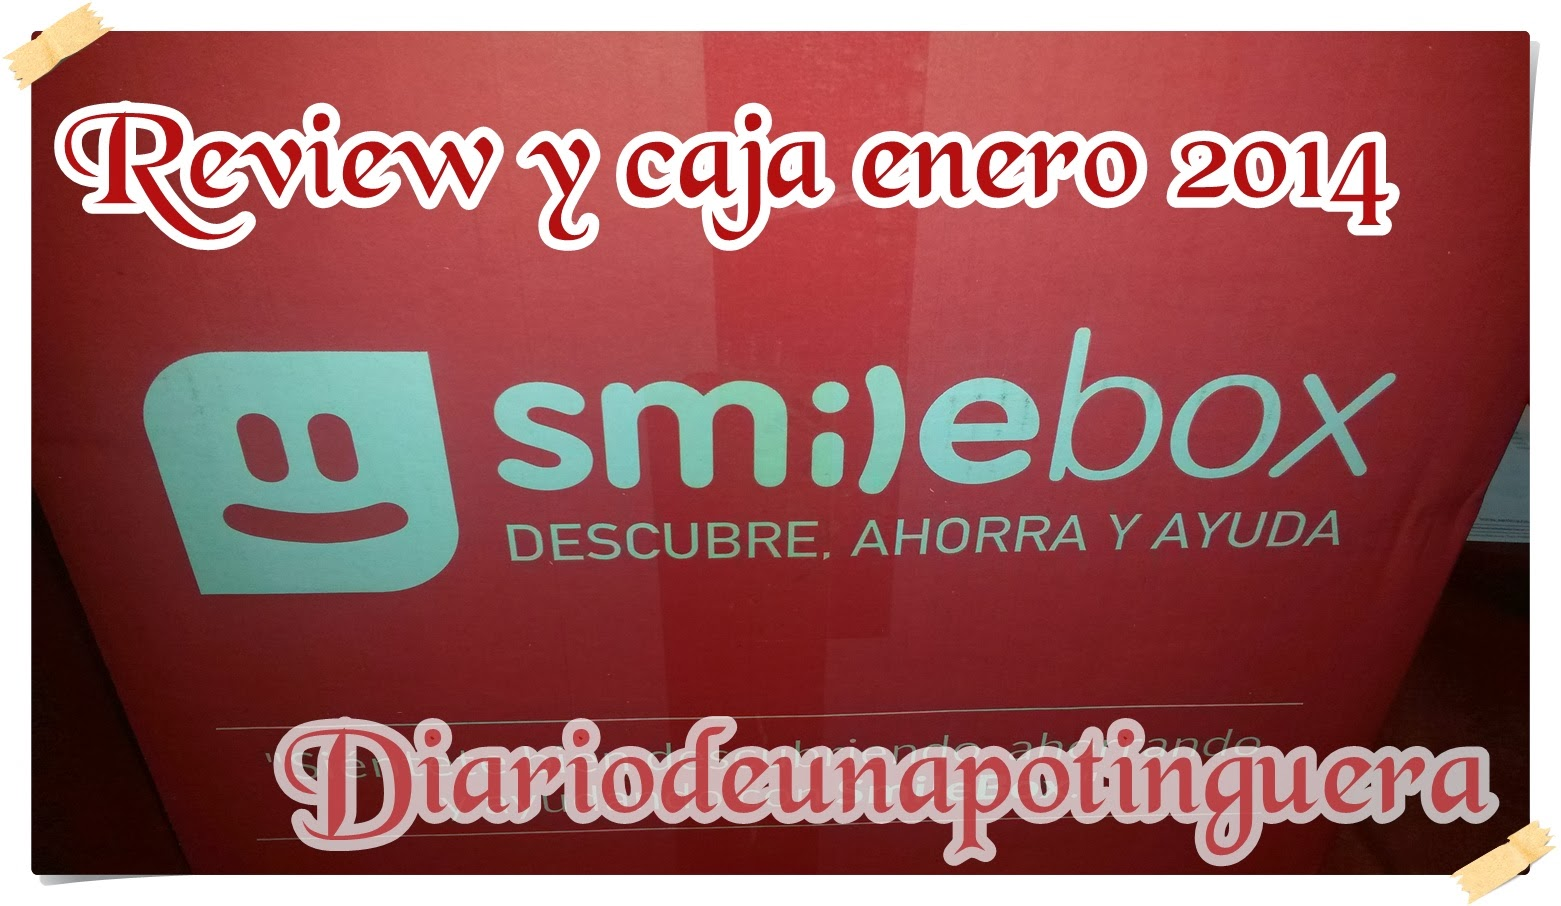 http://diariodeunapotinguera.blogspot.com.es/2014/02/review-smile-box-y-su-caja-de-enero-2014.html